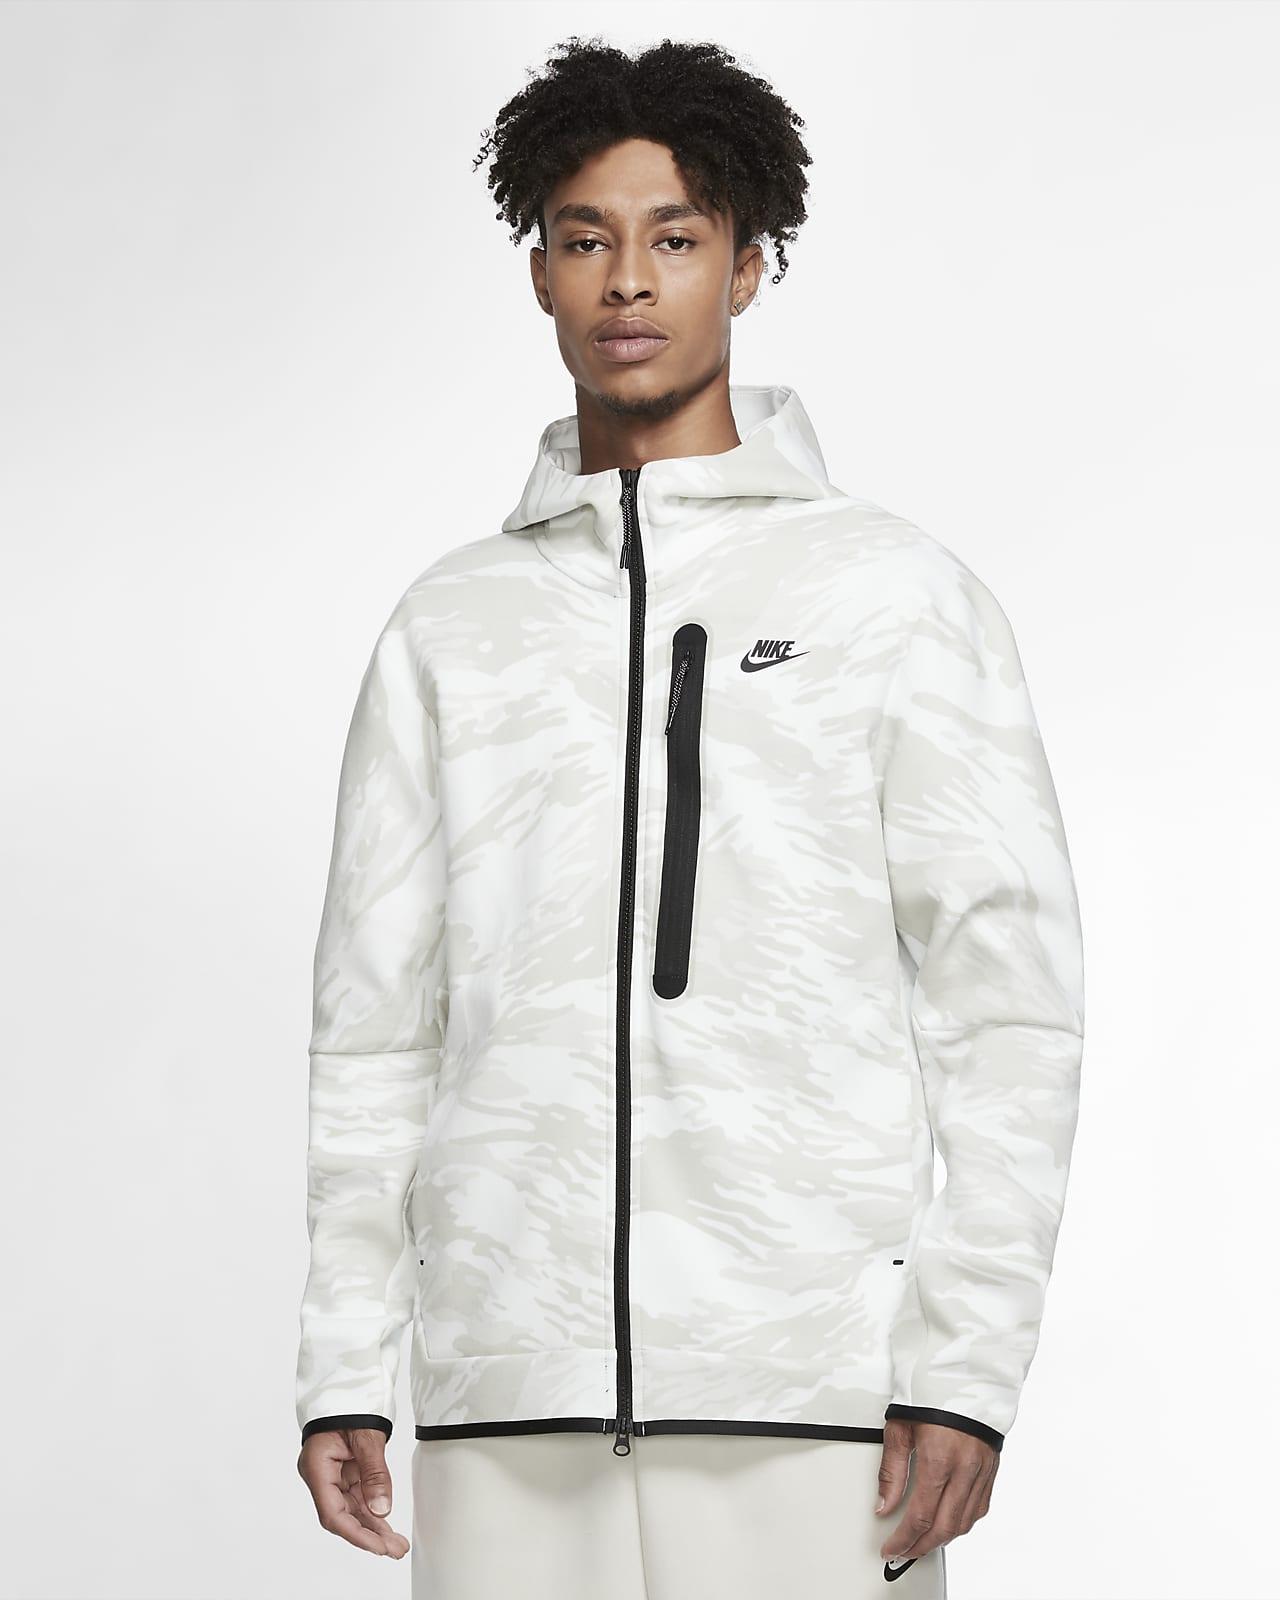 Nike Sportswear Tech Fleece Sudadera con capucha de camuflaje con cremallera completa - Hombre